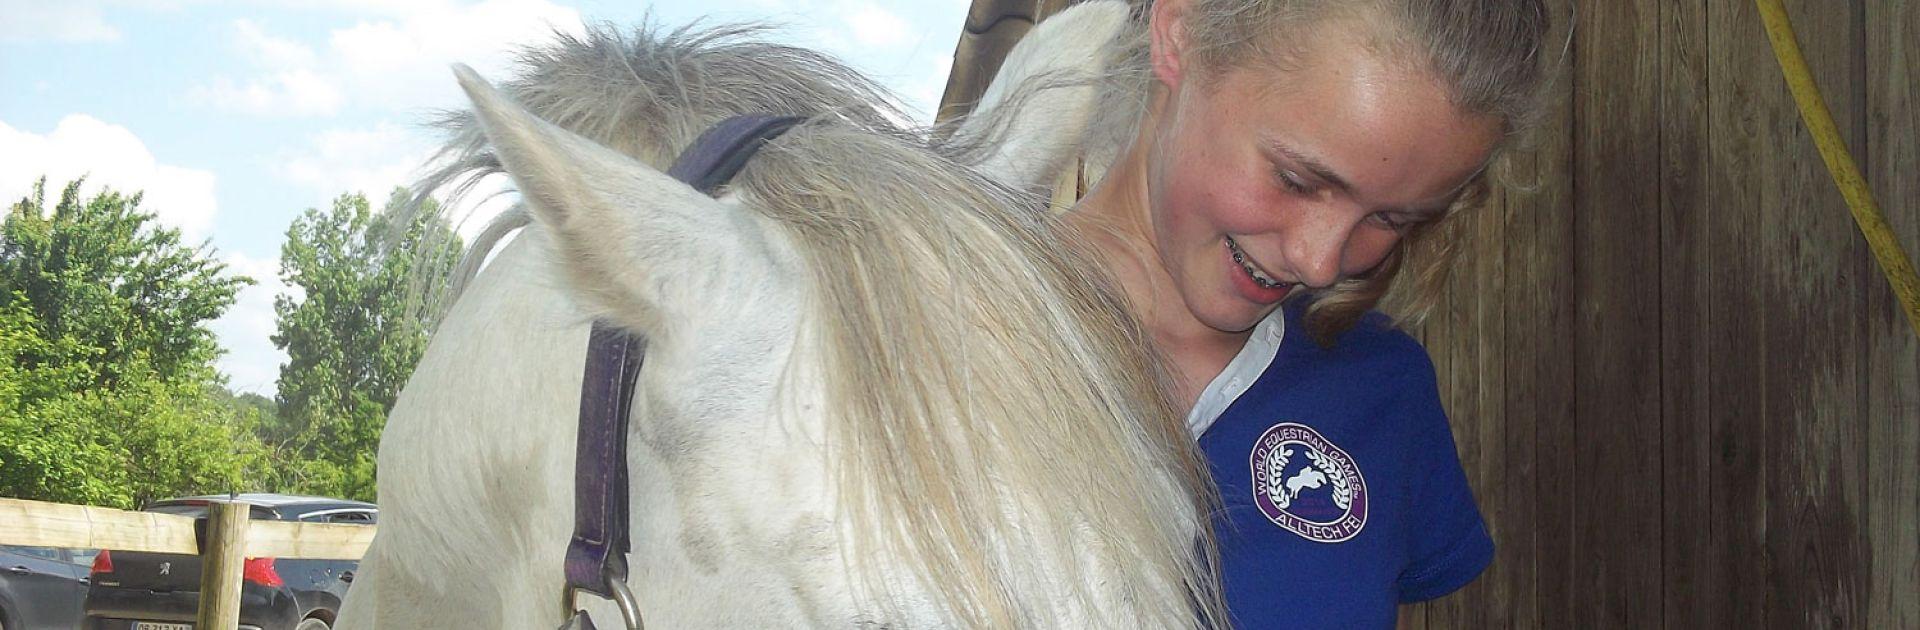 Paard rijden poney Milhac de Nontron Dordogne